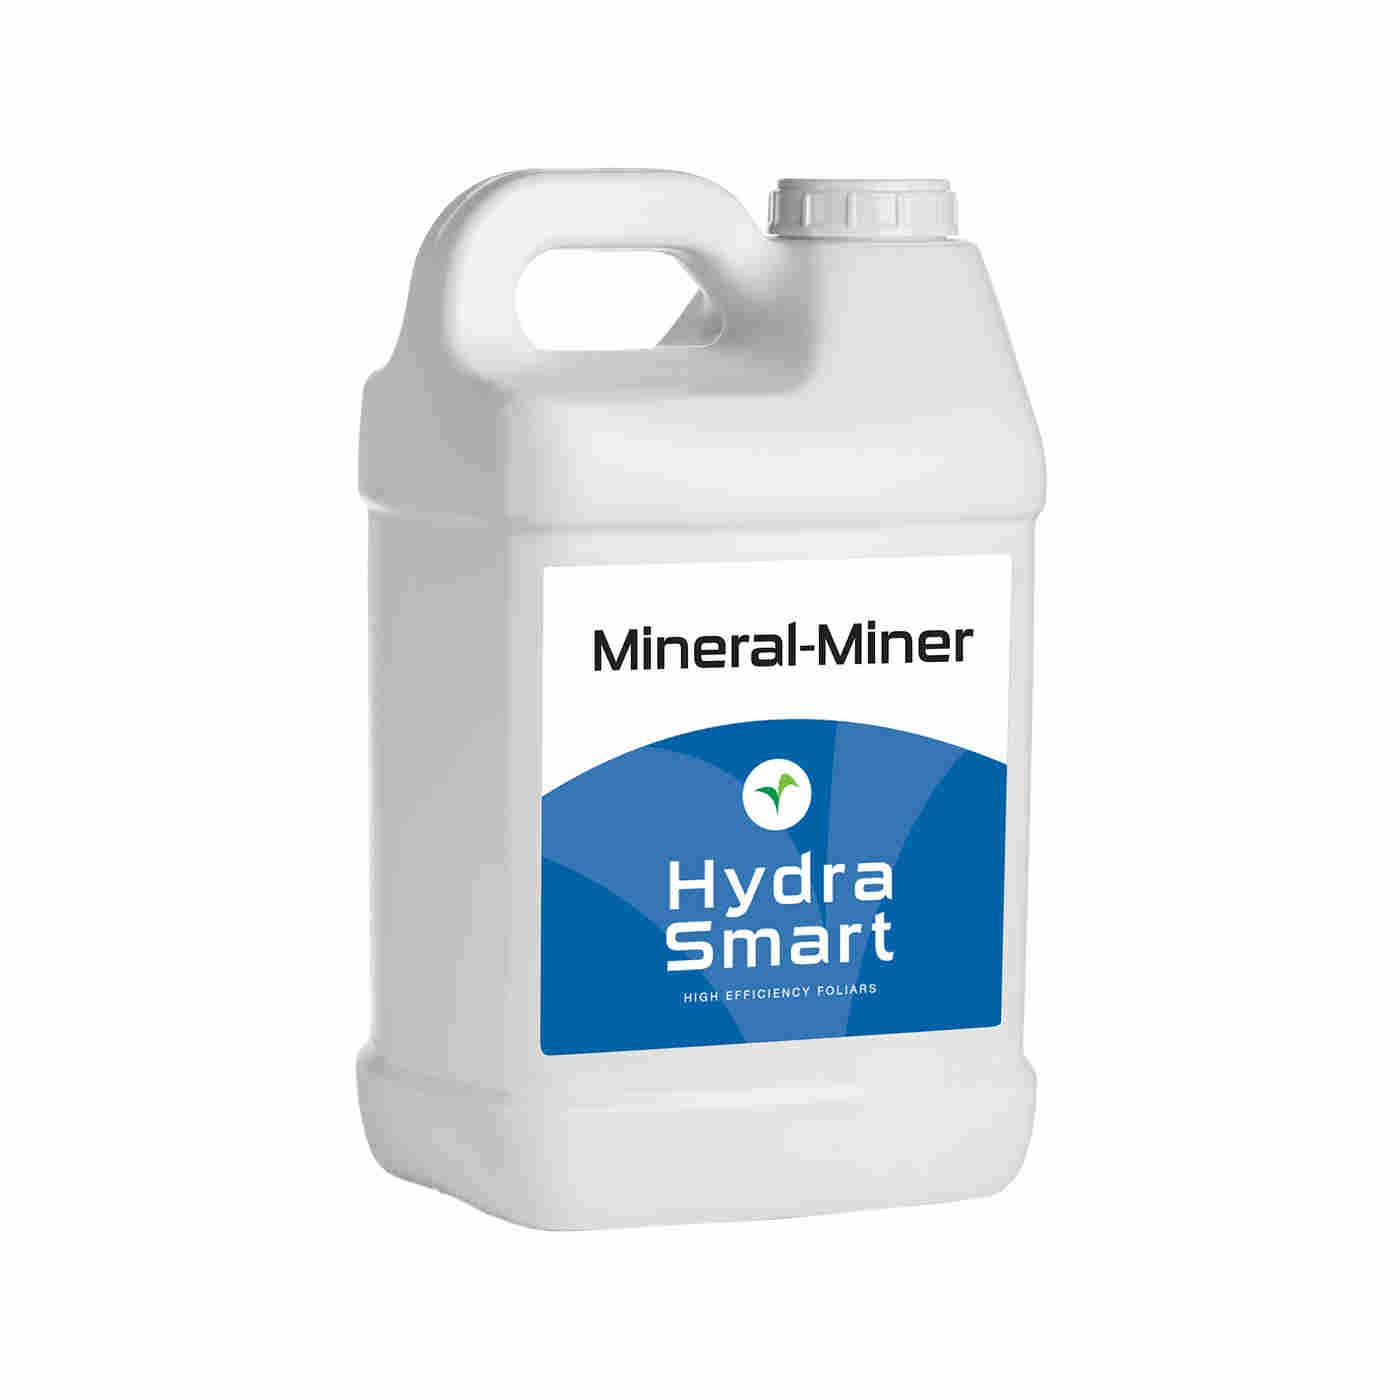 Mineral miner 2017